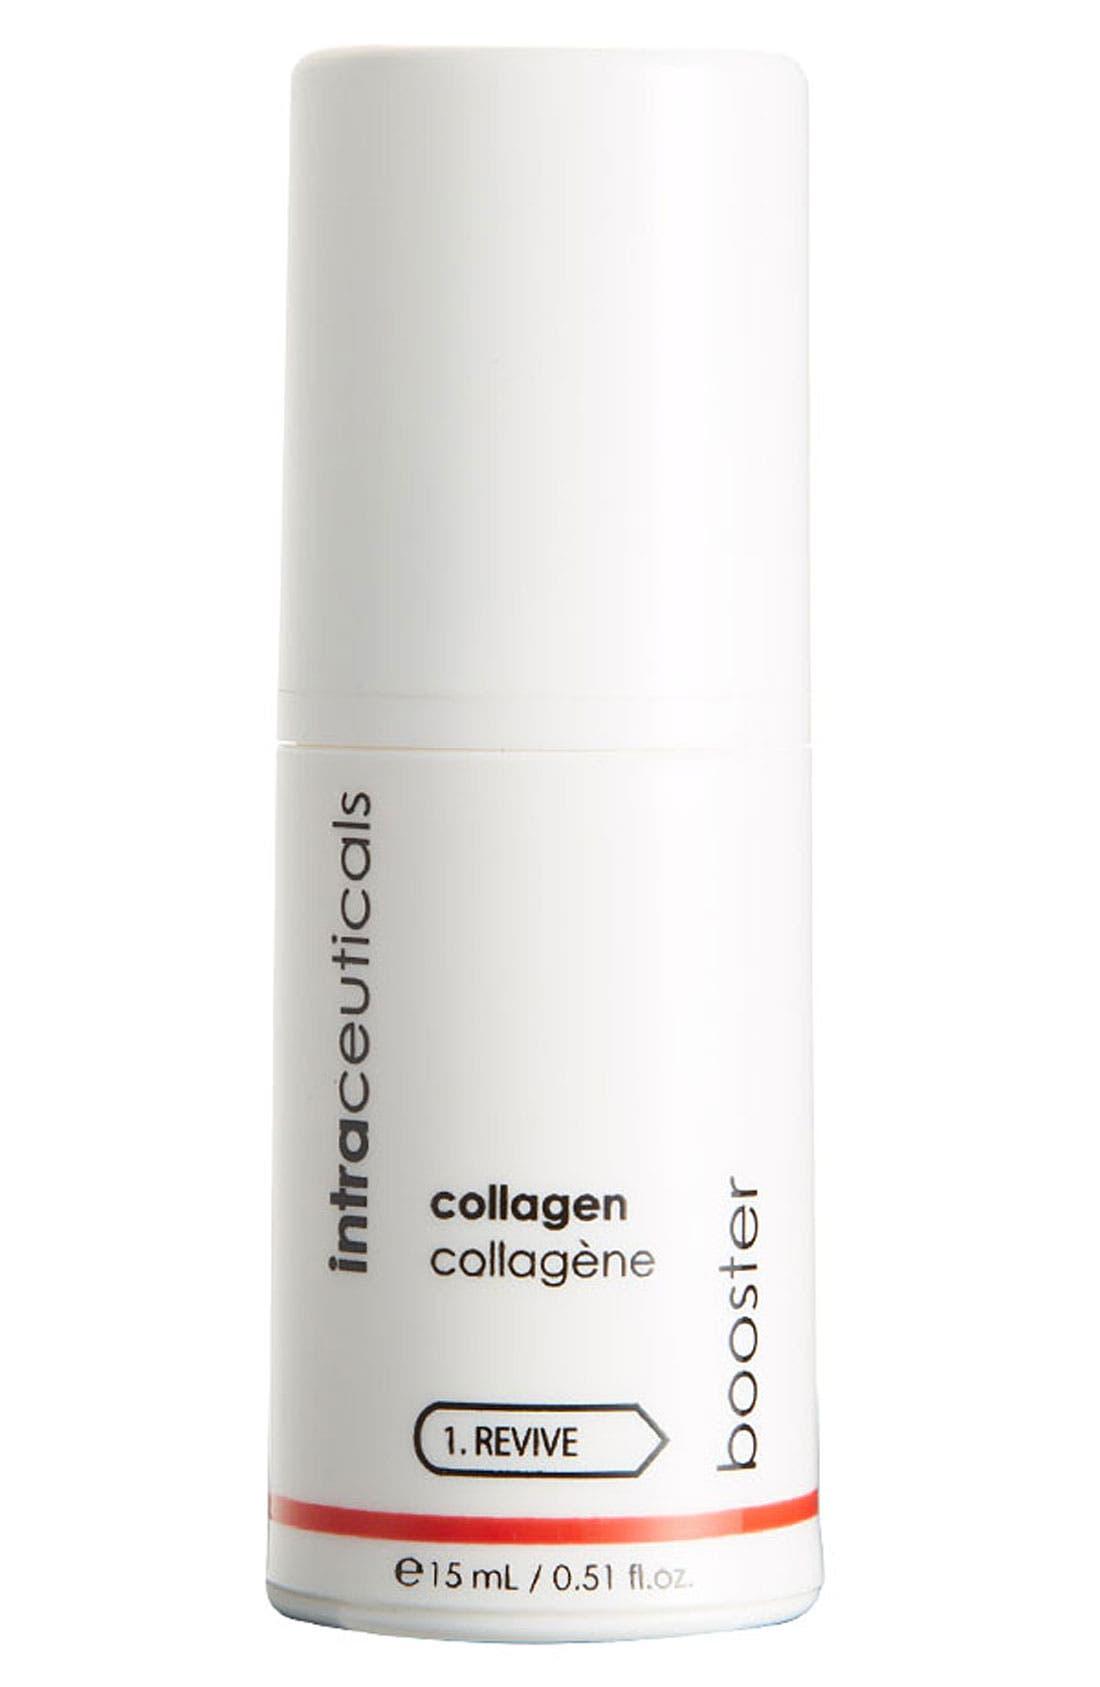 'Booster' Collagen Serum,                         Main,                         color,